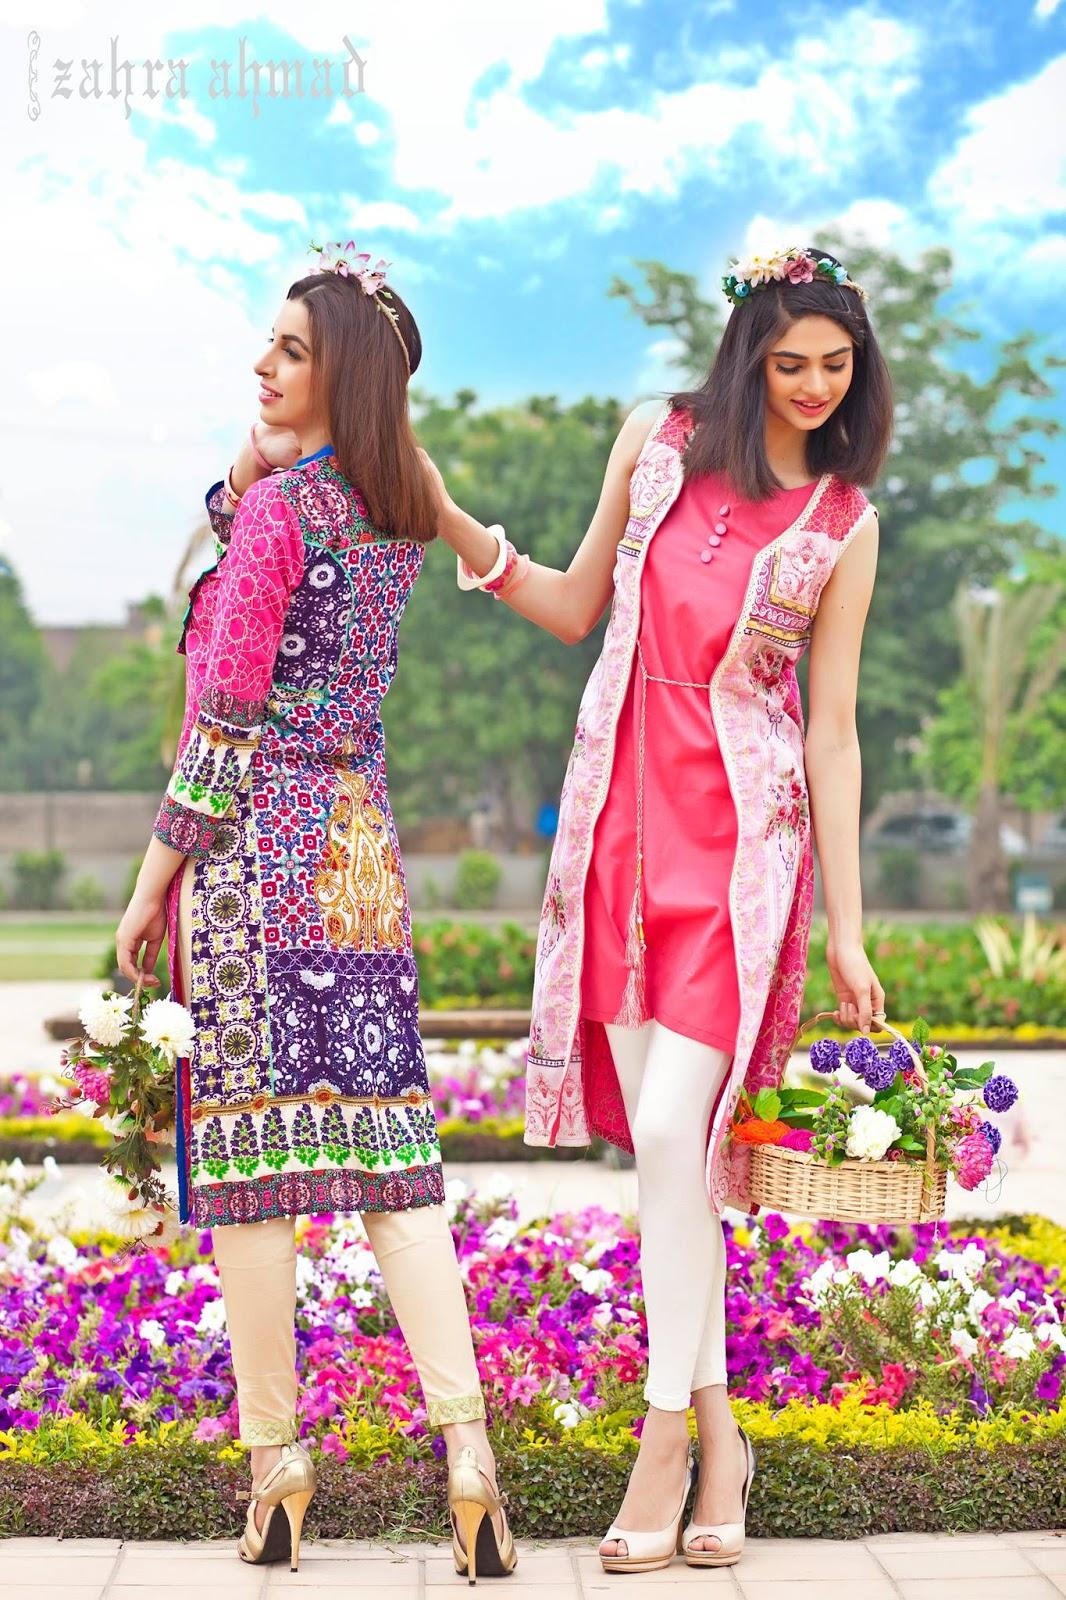 new Pakistani girls dresses designs by Zahra Ahmad